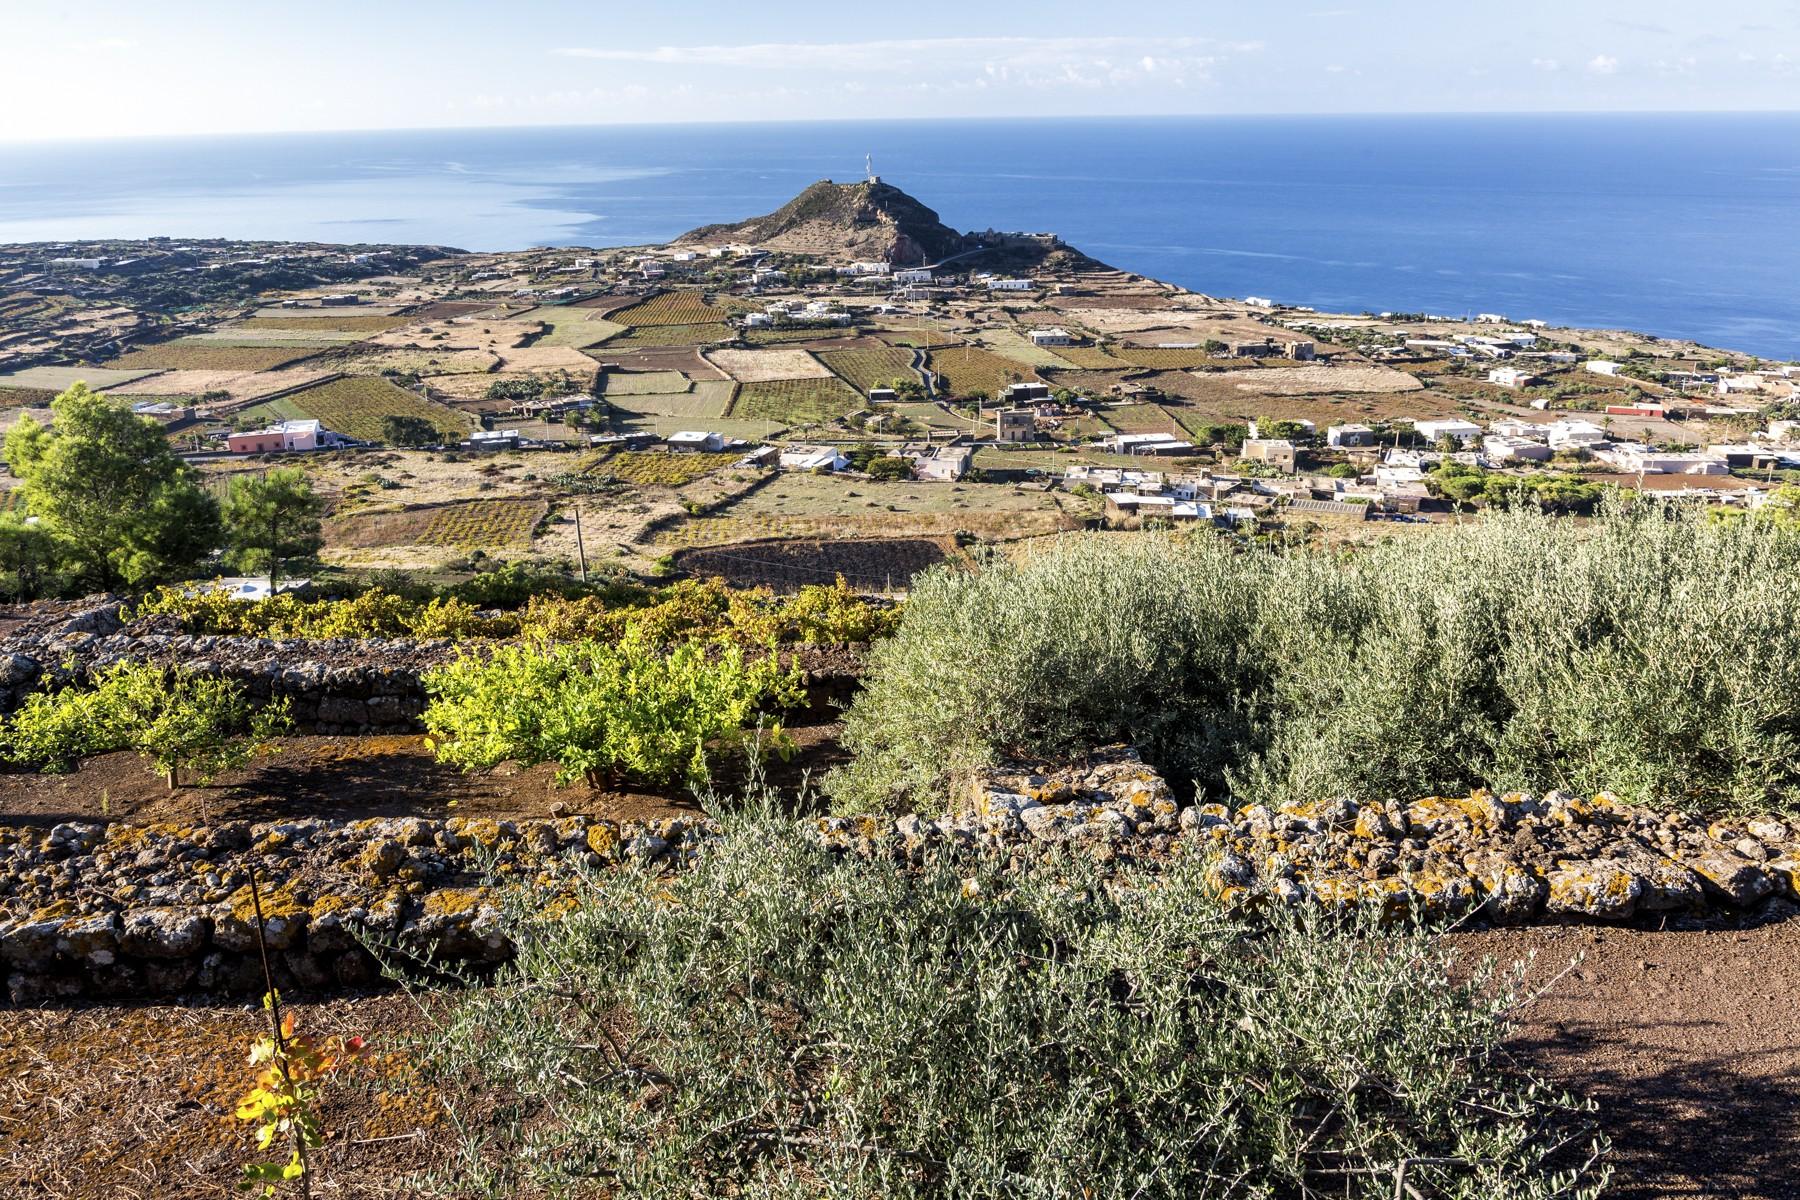 Villa in Vendita a Pantelleria: 5 locali, 530 mq - Foto 20